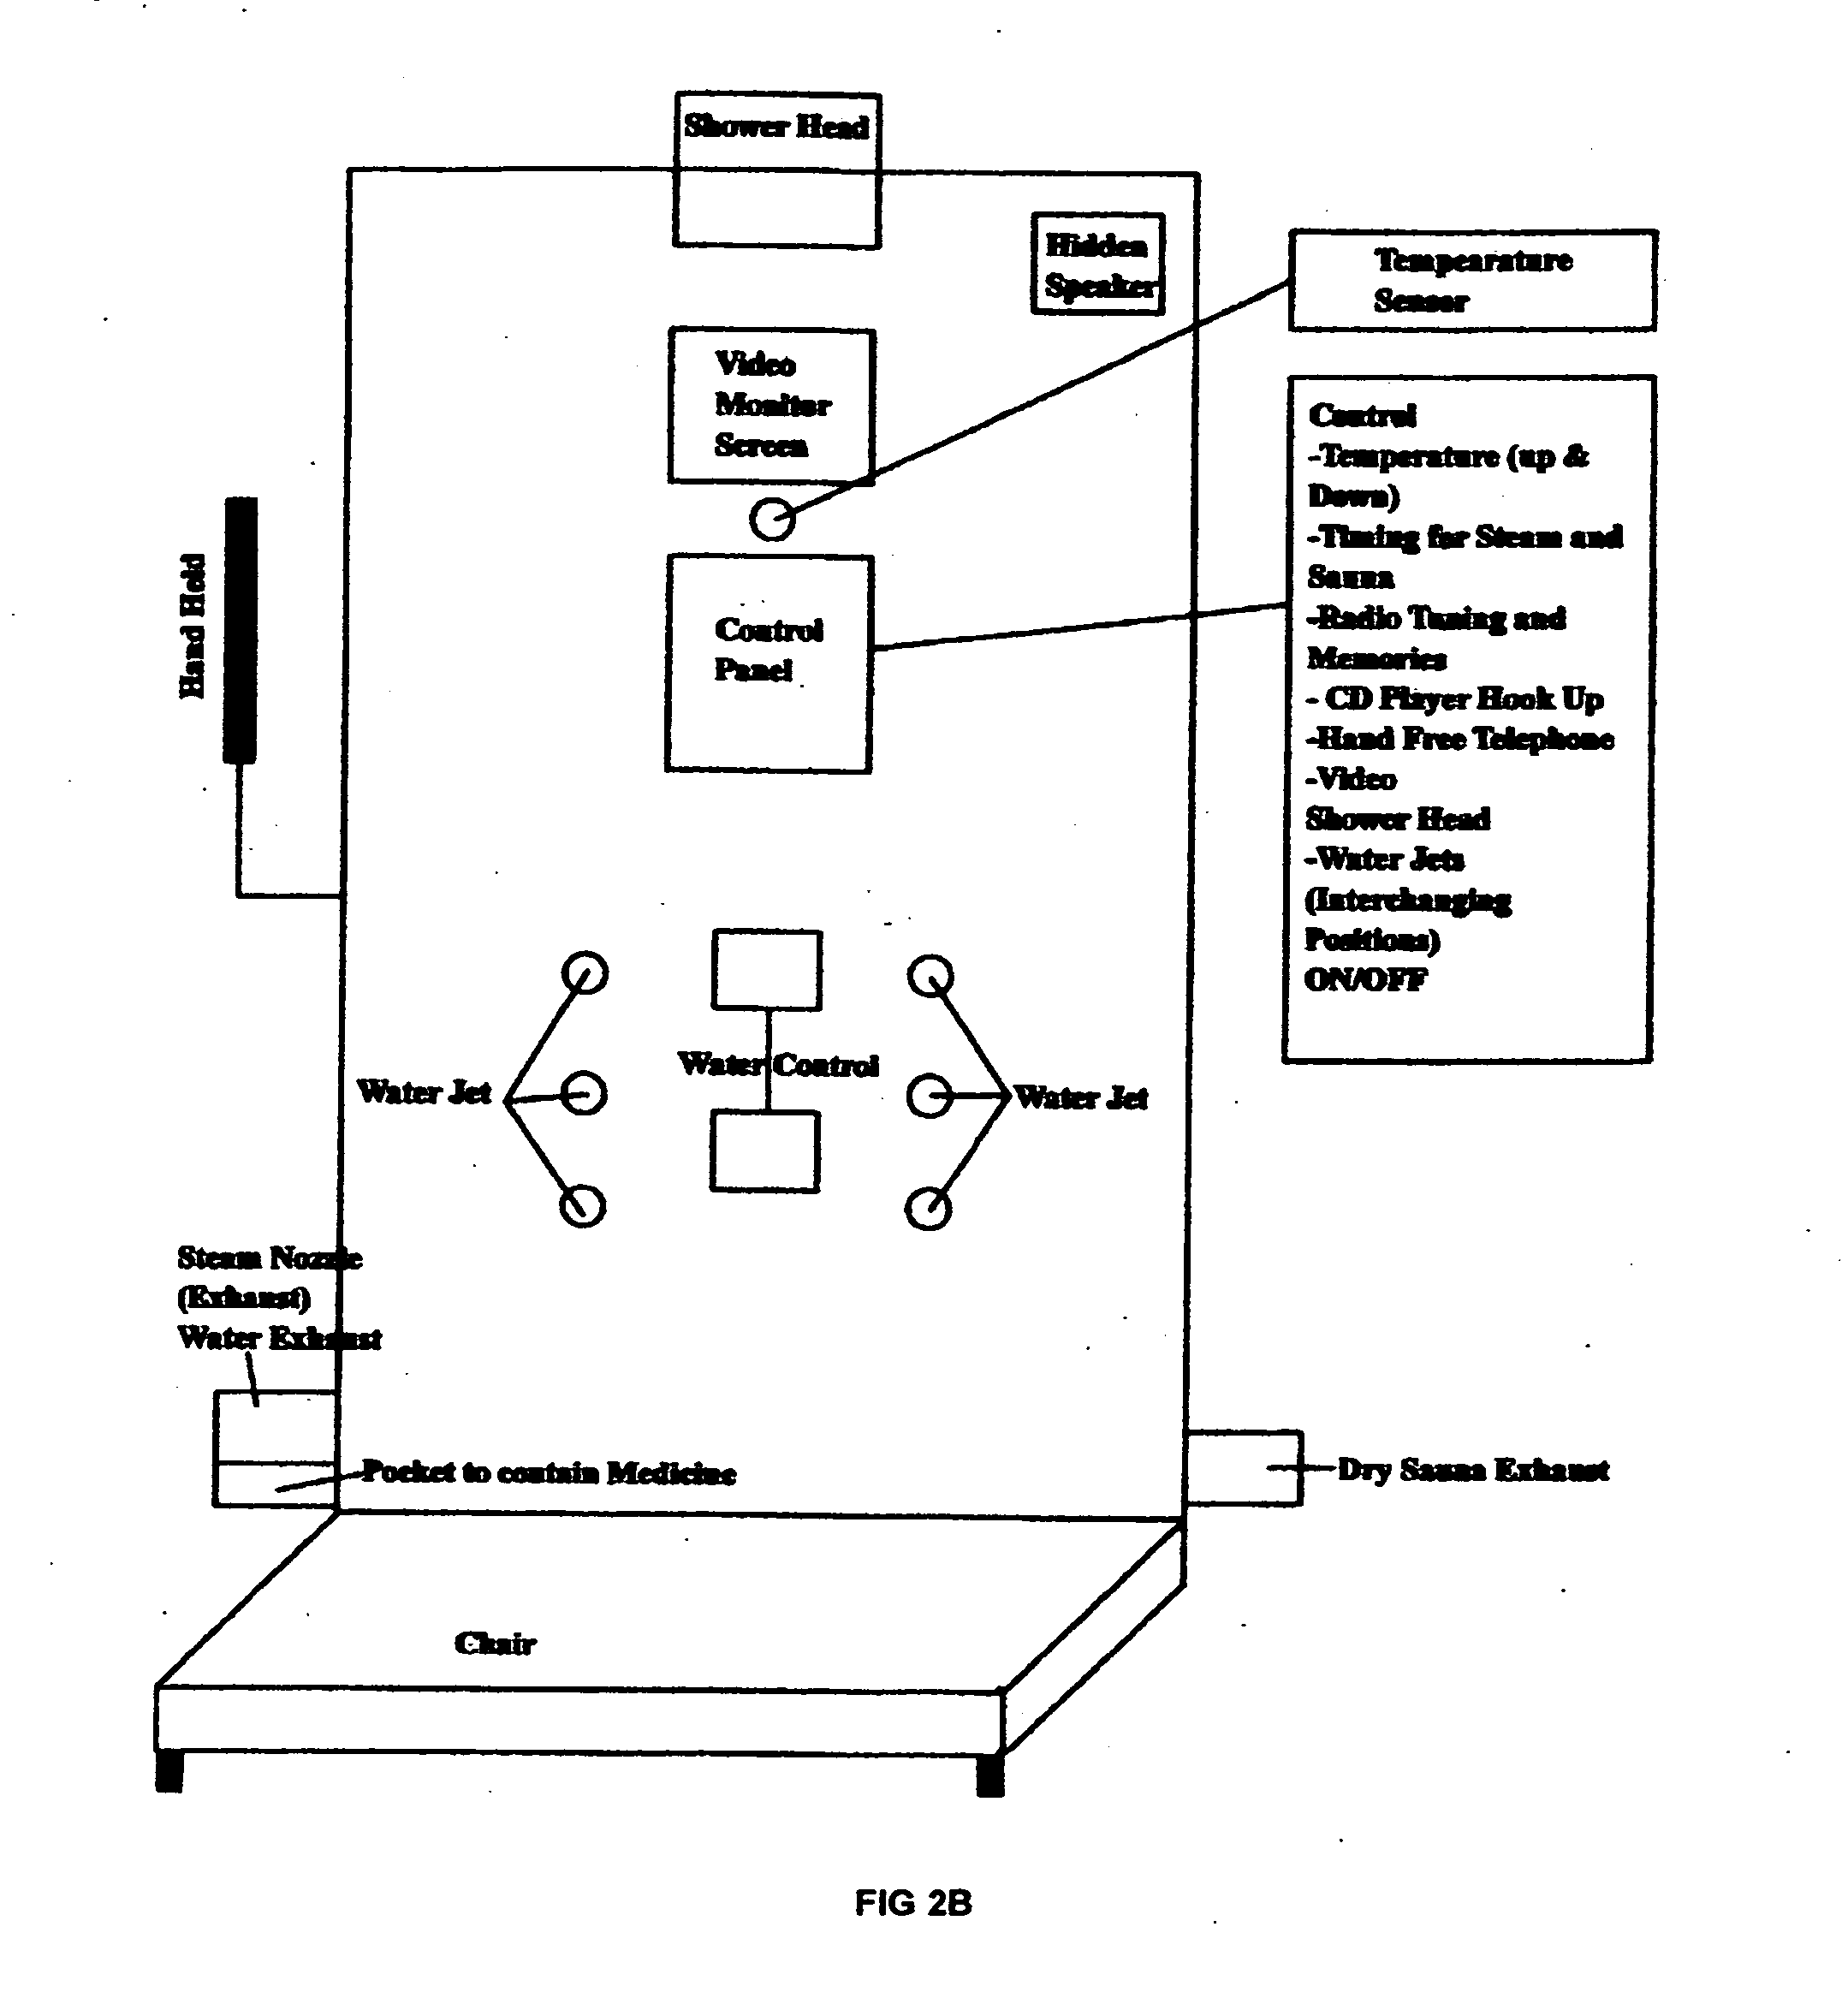 1986 chevy k10 pickup truck heater wiring diagram 1986